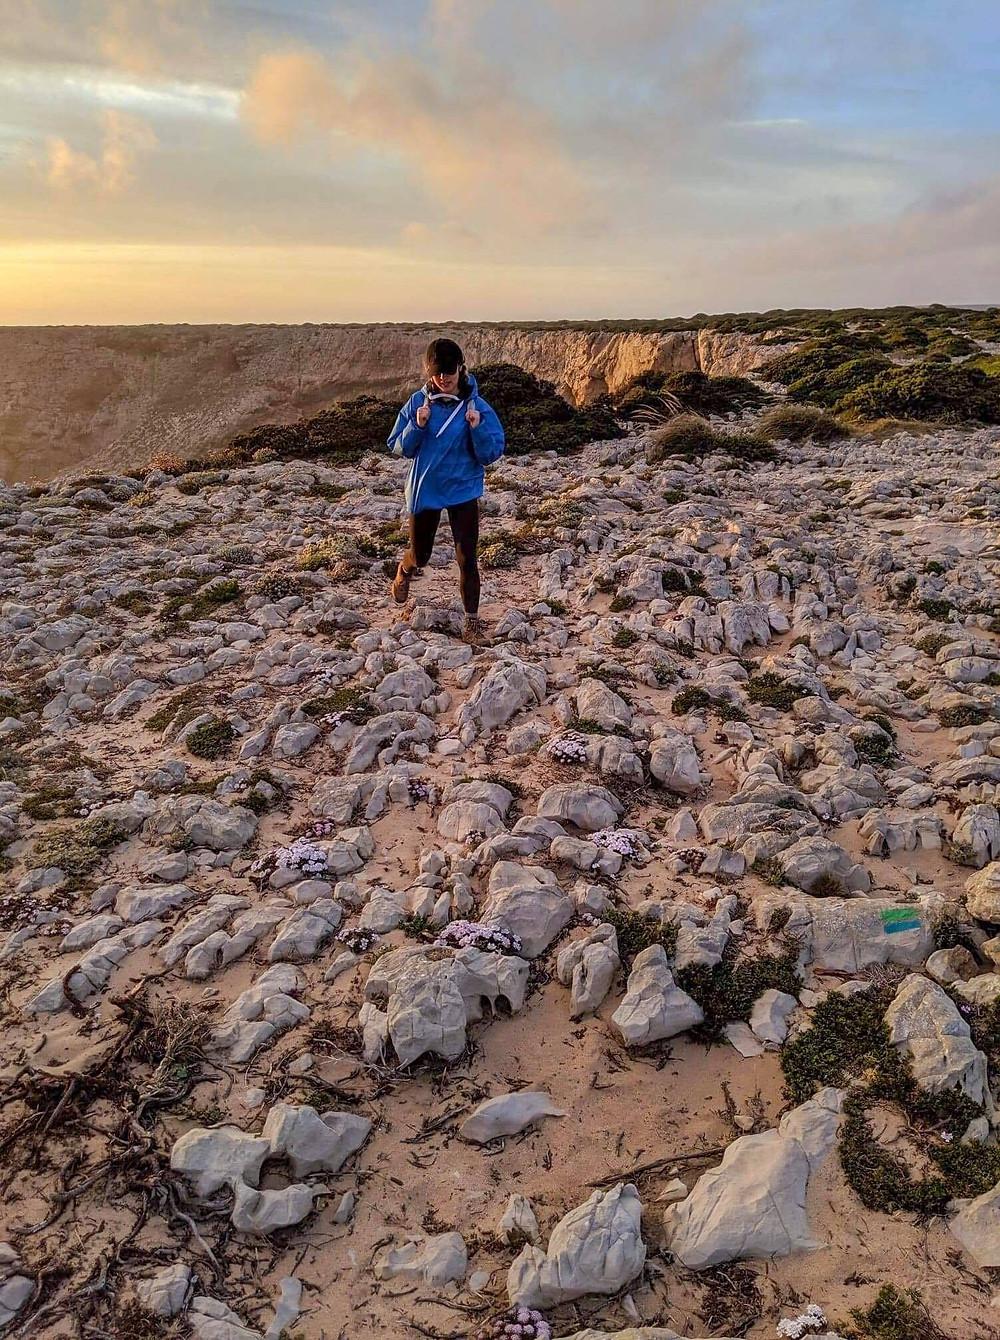 Girl travel blogger hiking in Portugal Algarve during sunset.